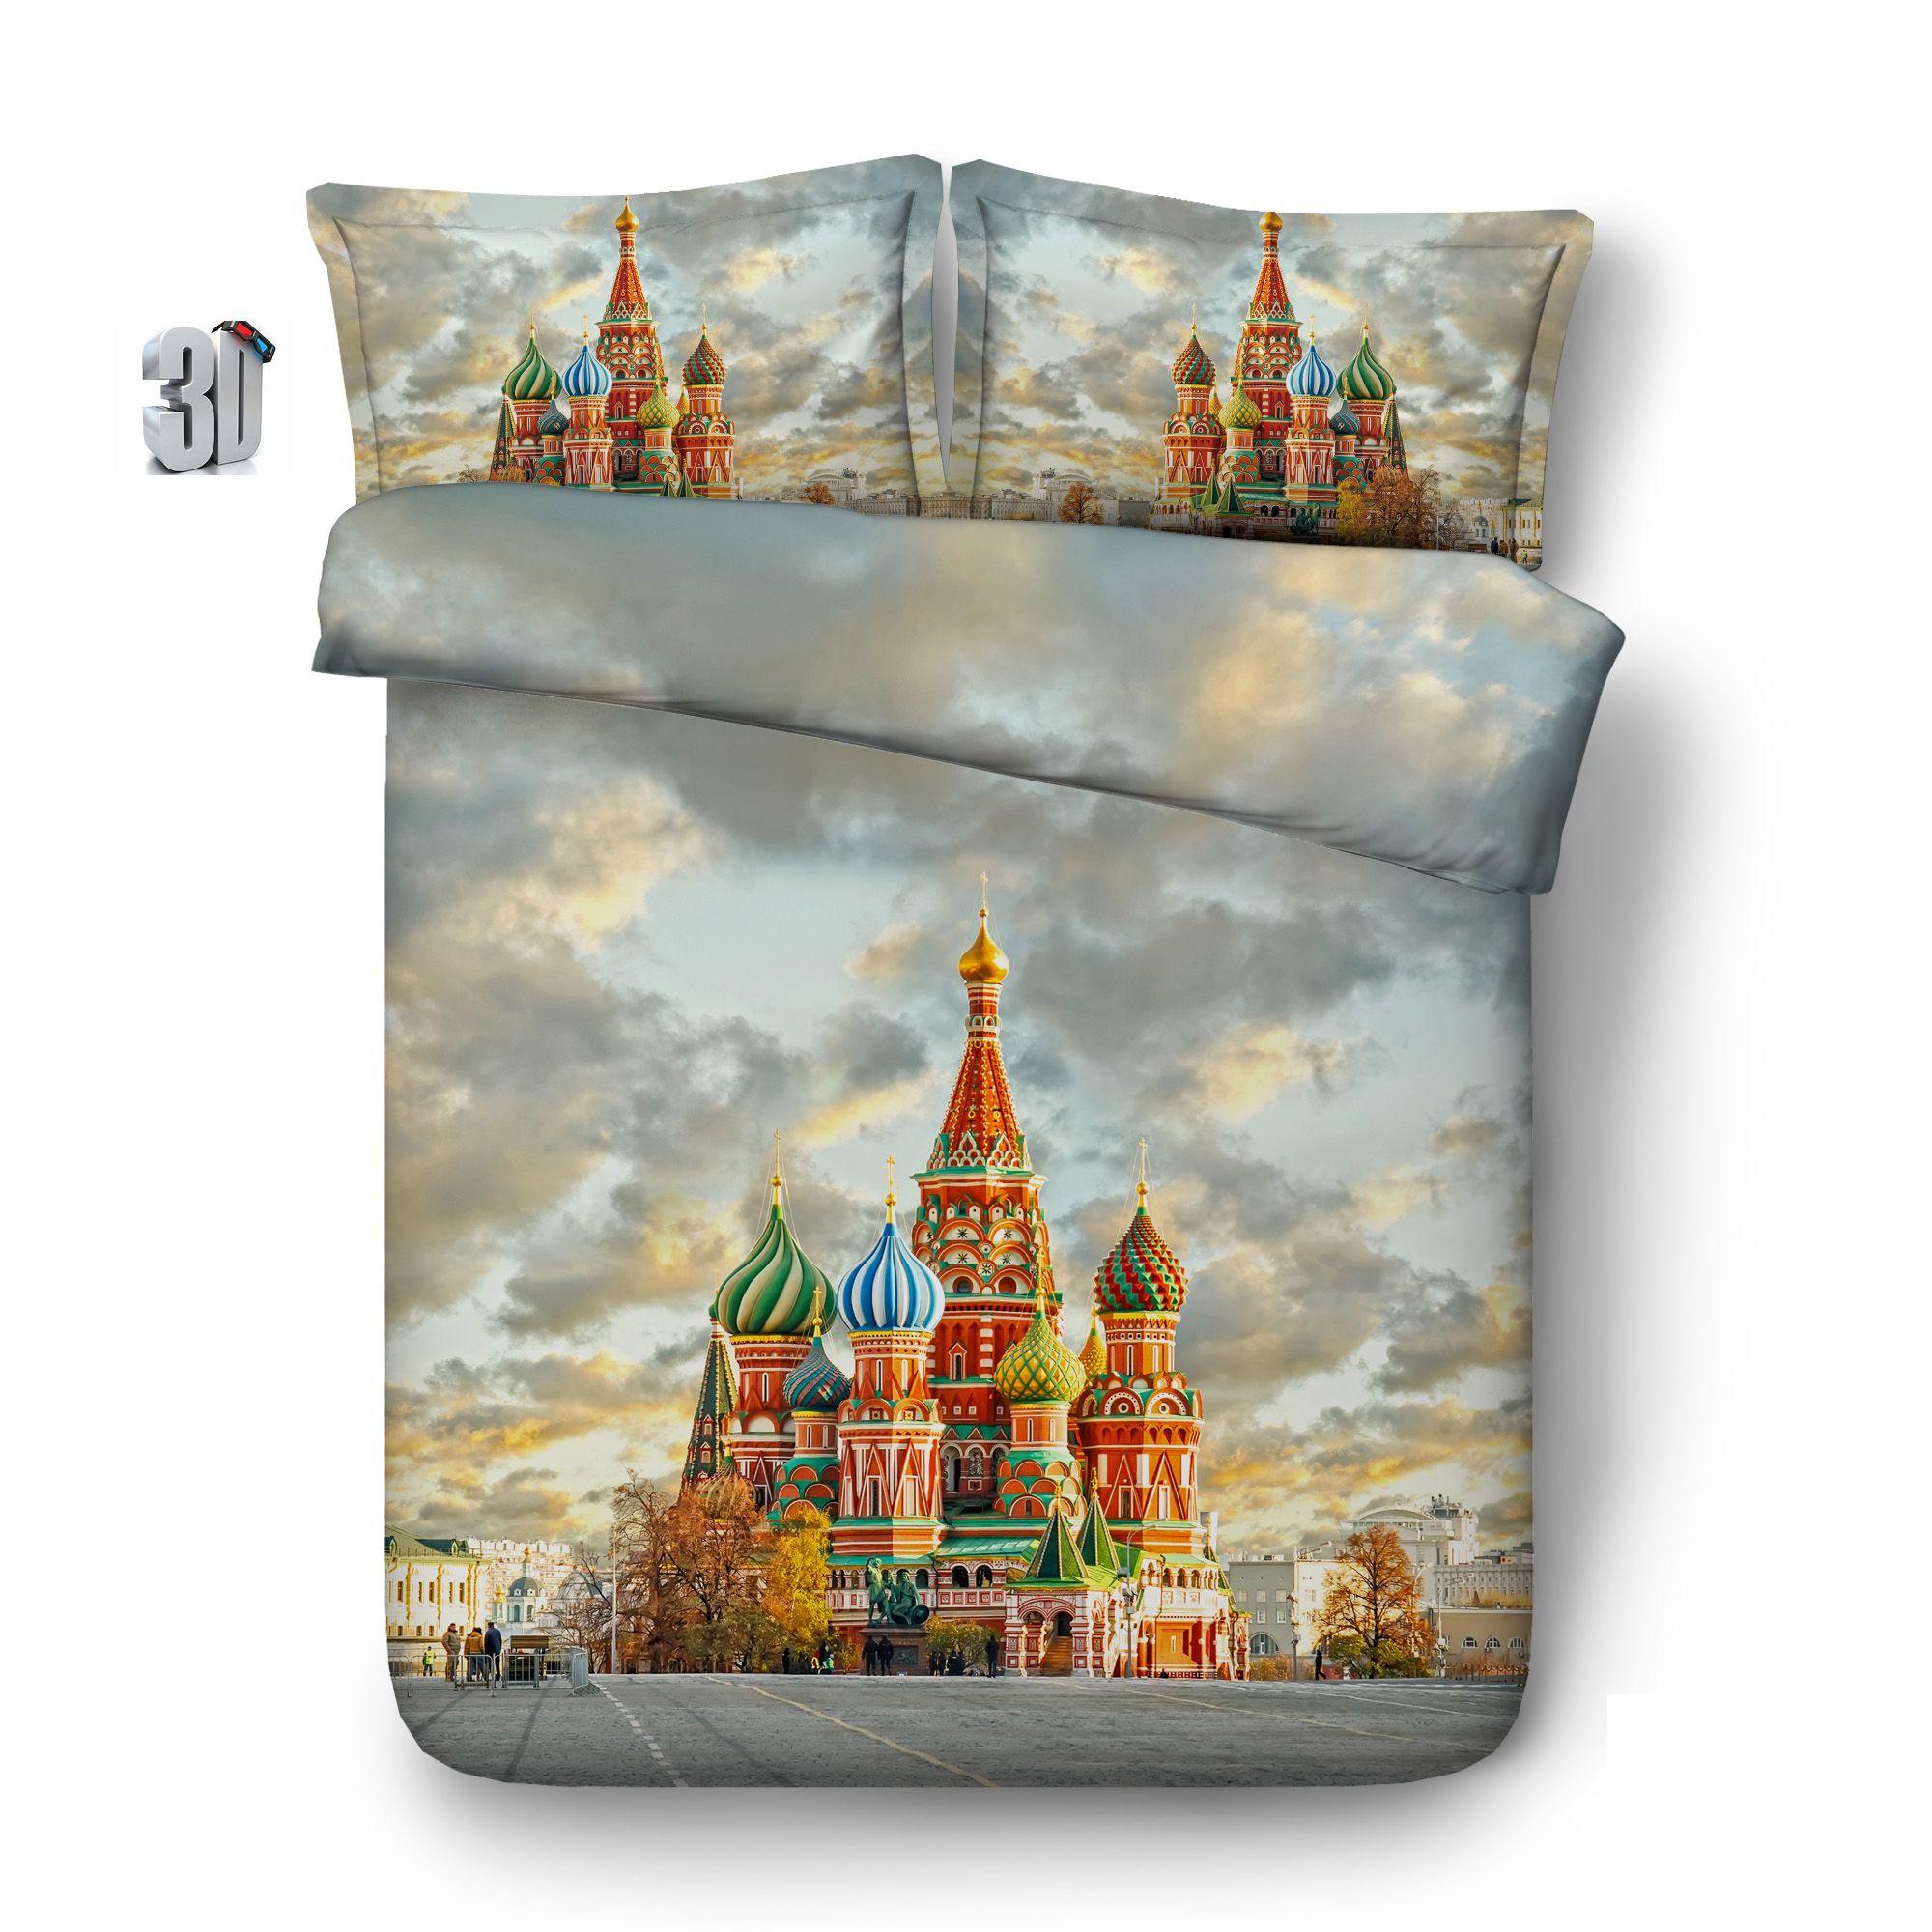 150x200CM 3PCS 3D Tree castle Print Duvet Cover Set Bedding with pillowcase, Microfiber Quilt Cover, Zipper Closure, NO Comforter